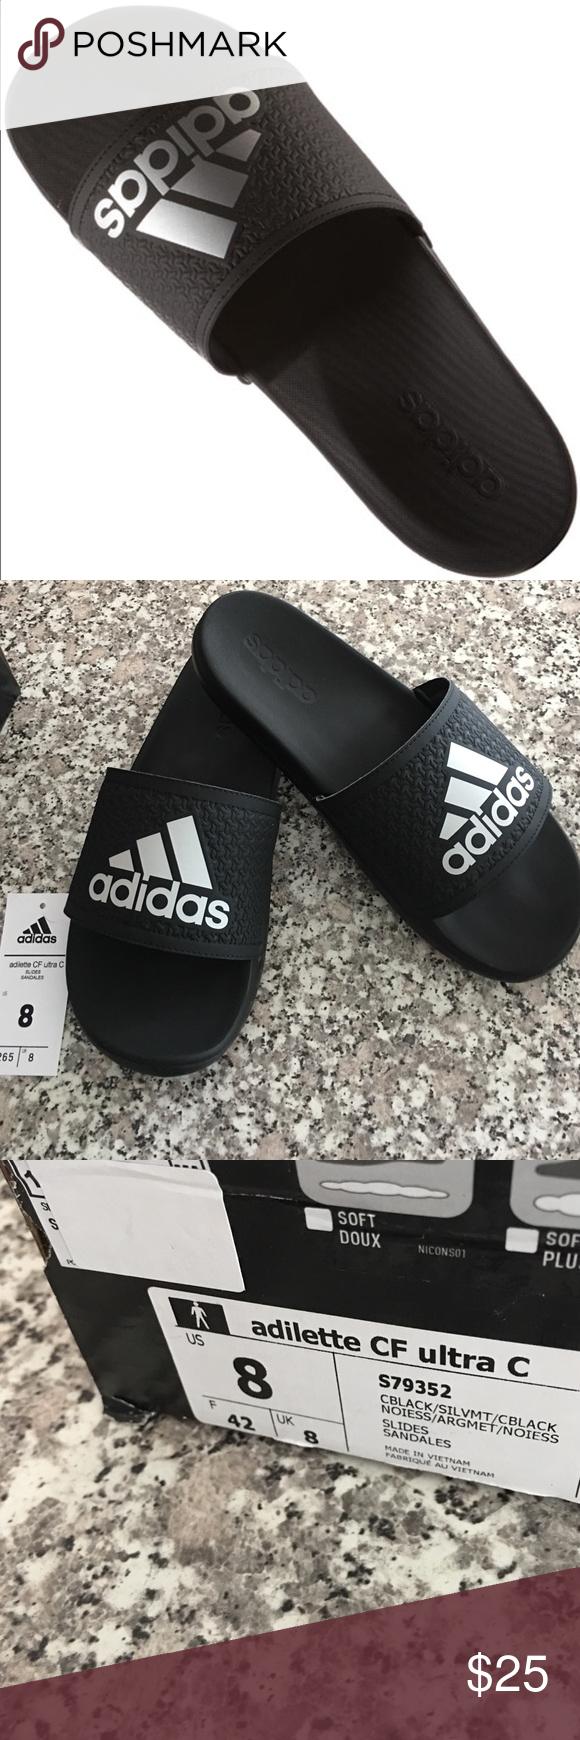 6fbce68509bd96 Men s Adidas slides. New in BOX 📦 adidas Mens Adilette Supercloud Plus  Slides Slip on